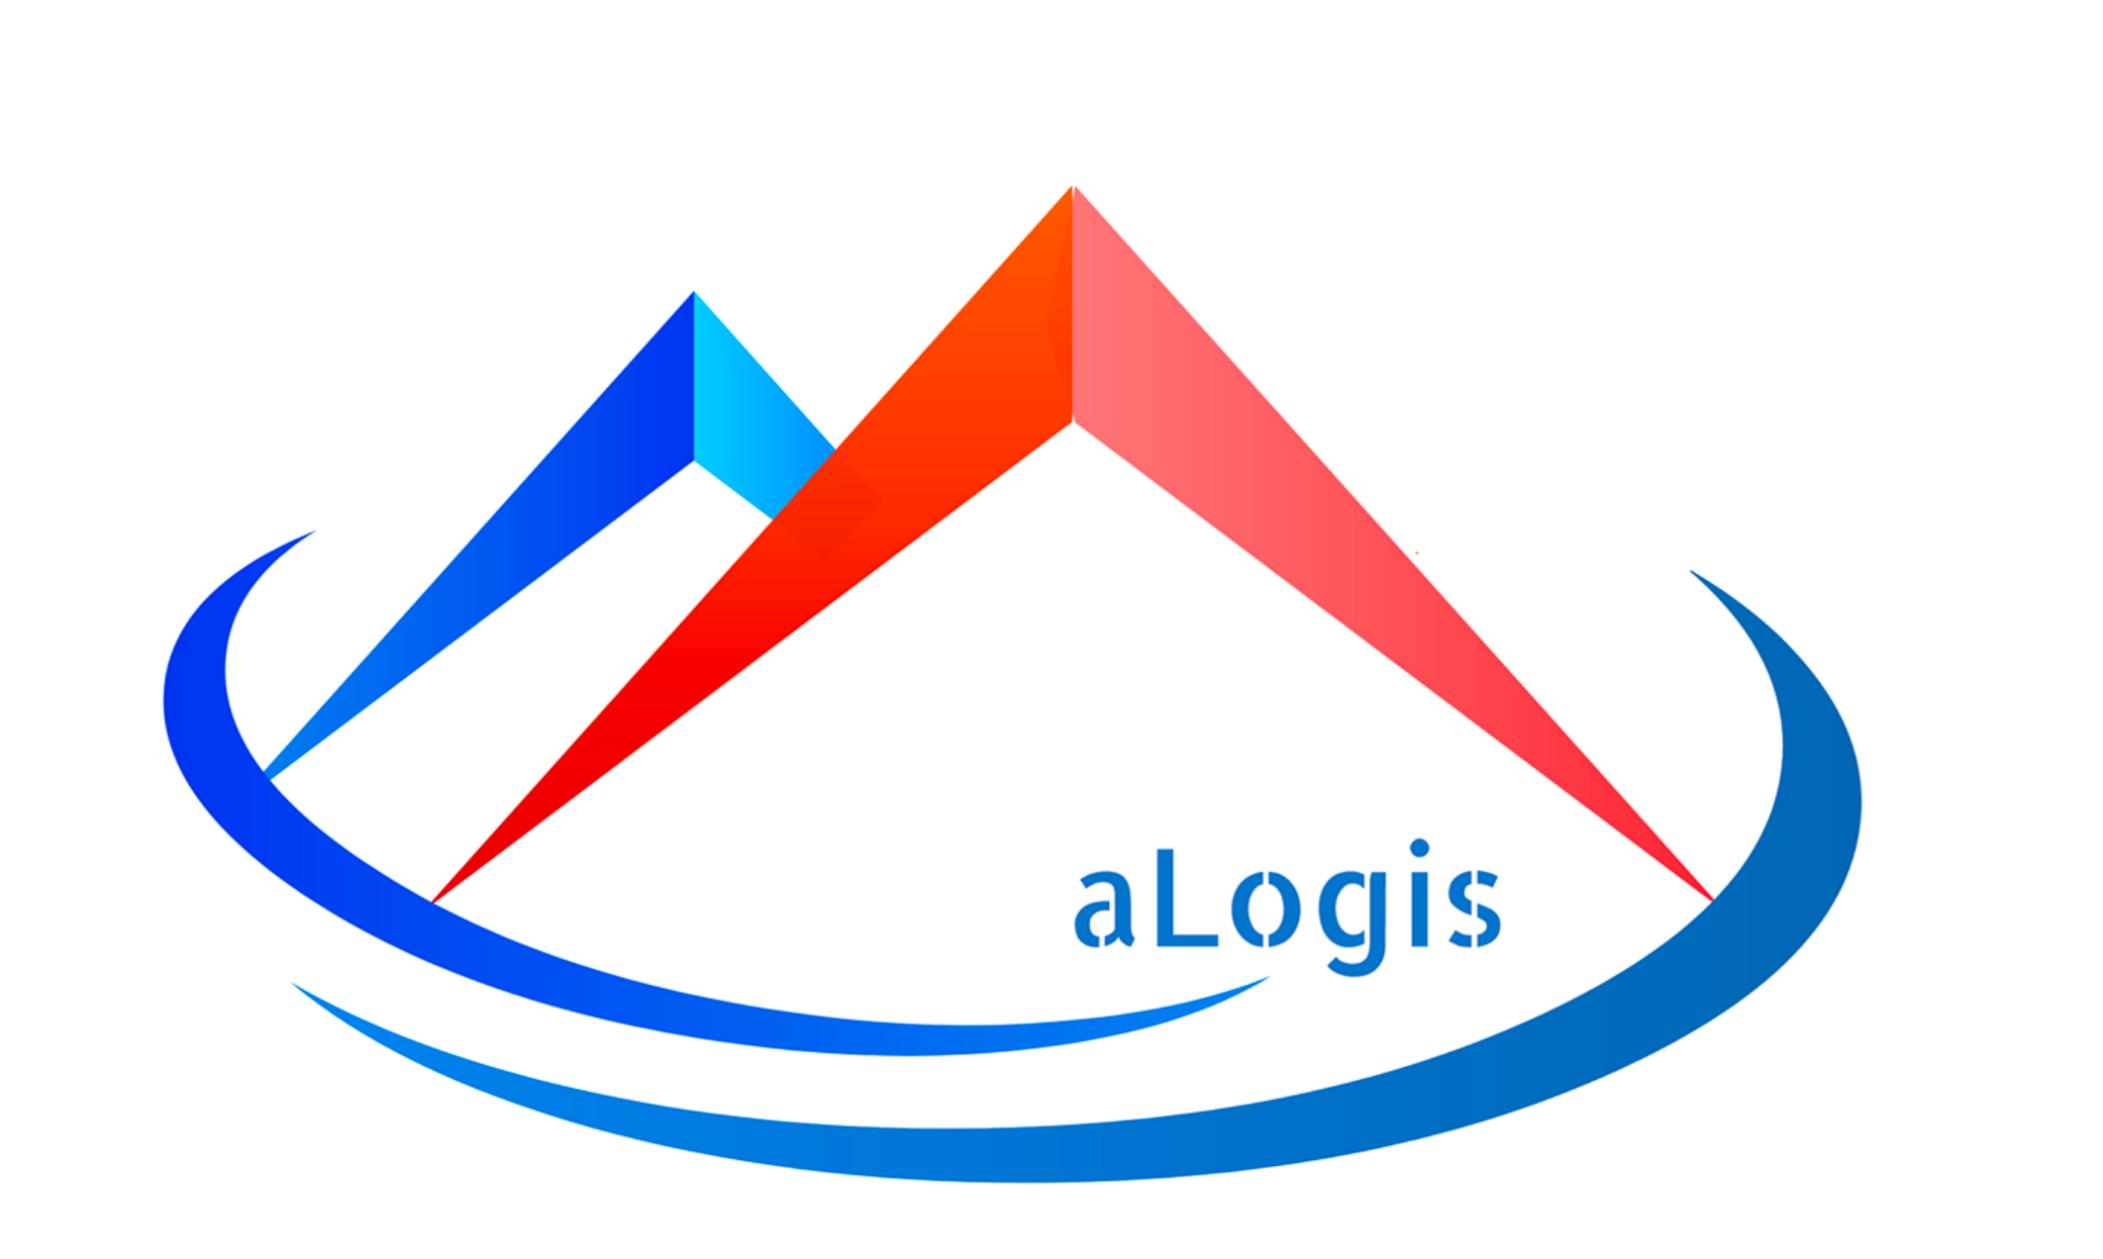 aLogis S.r.l. - Tel. 02 67072968